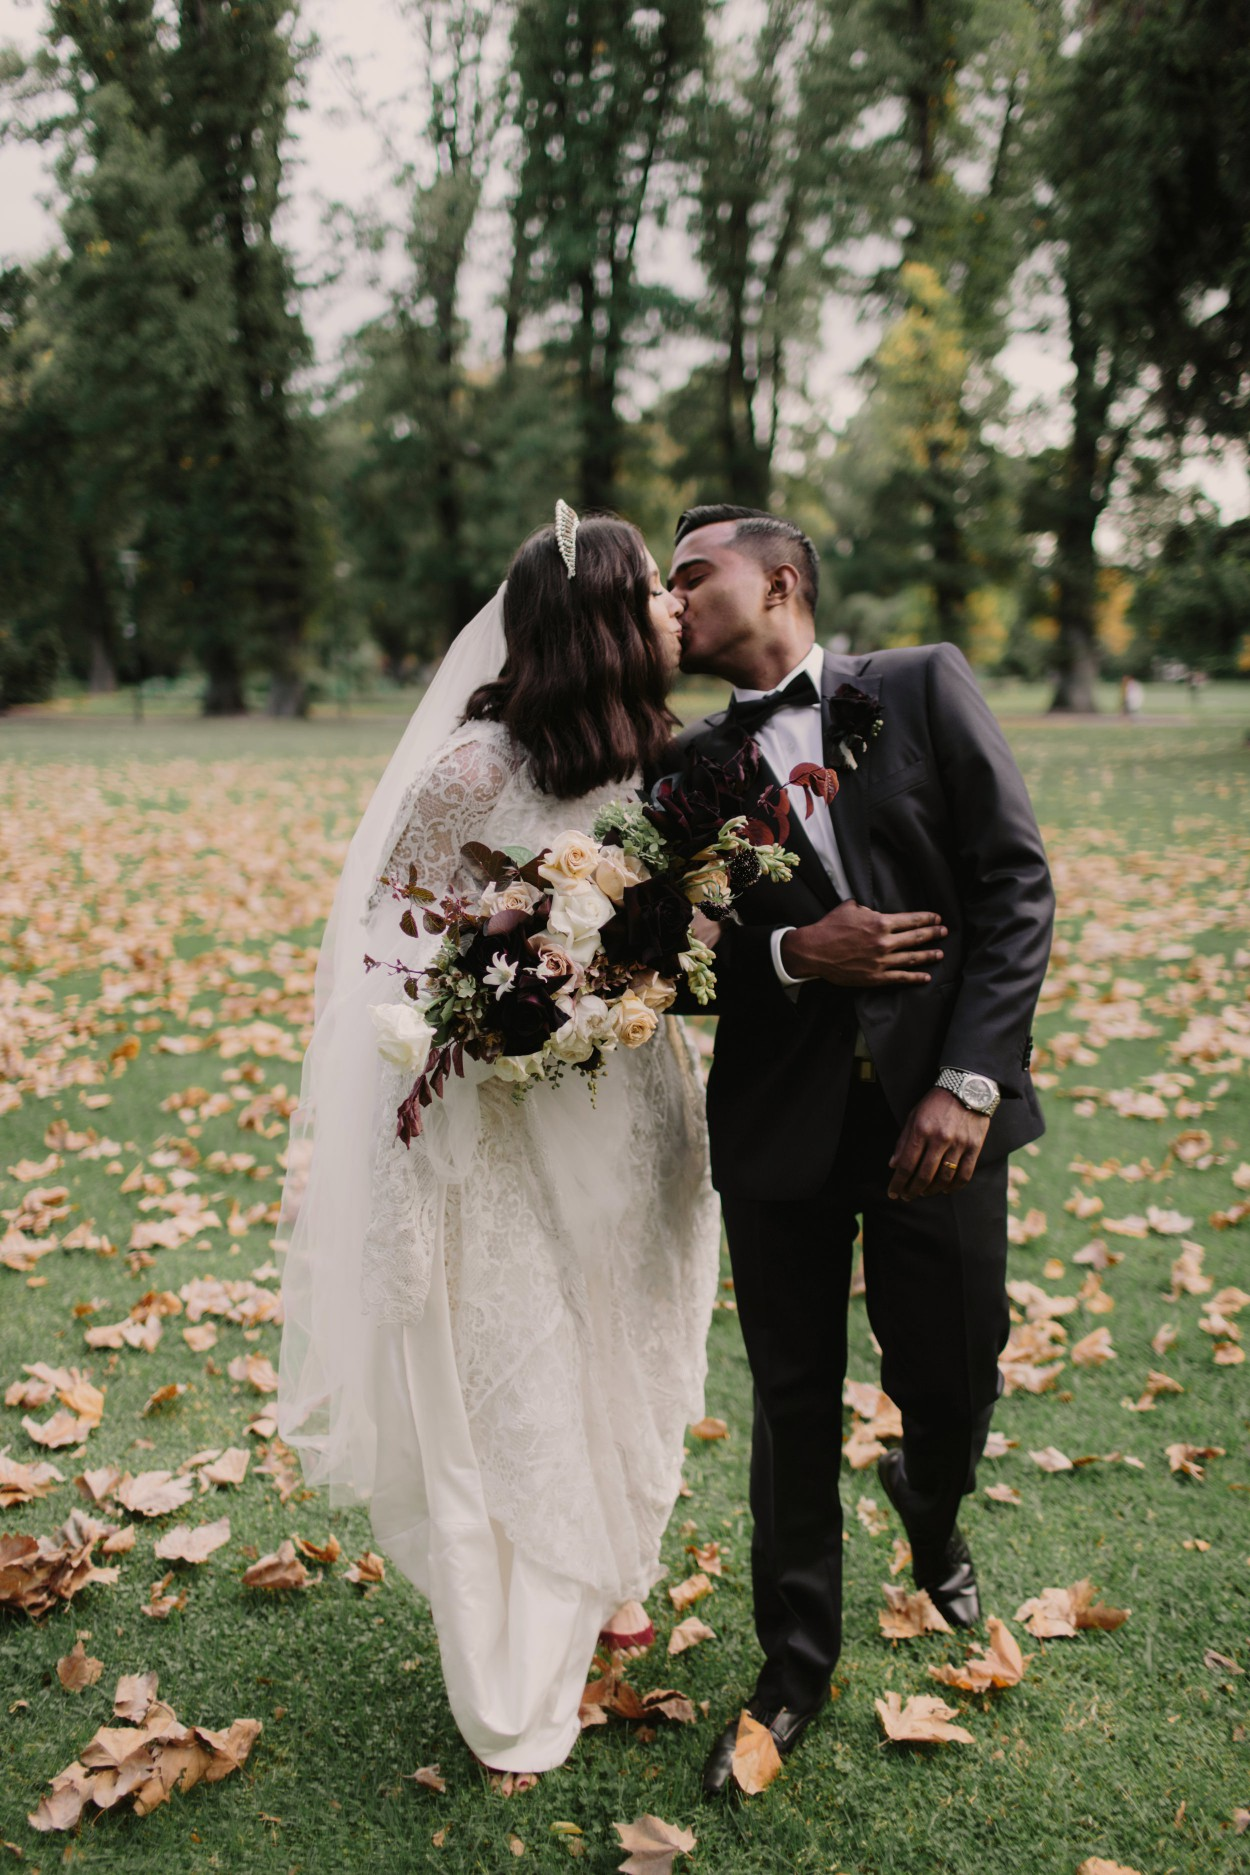 I-Got-You-Babe-Weddings-The-069George-Ballroom-St-Kilda-Wedding-Amy-Abhi.jpg